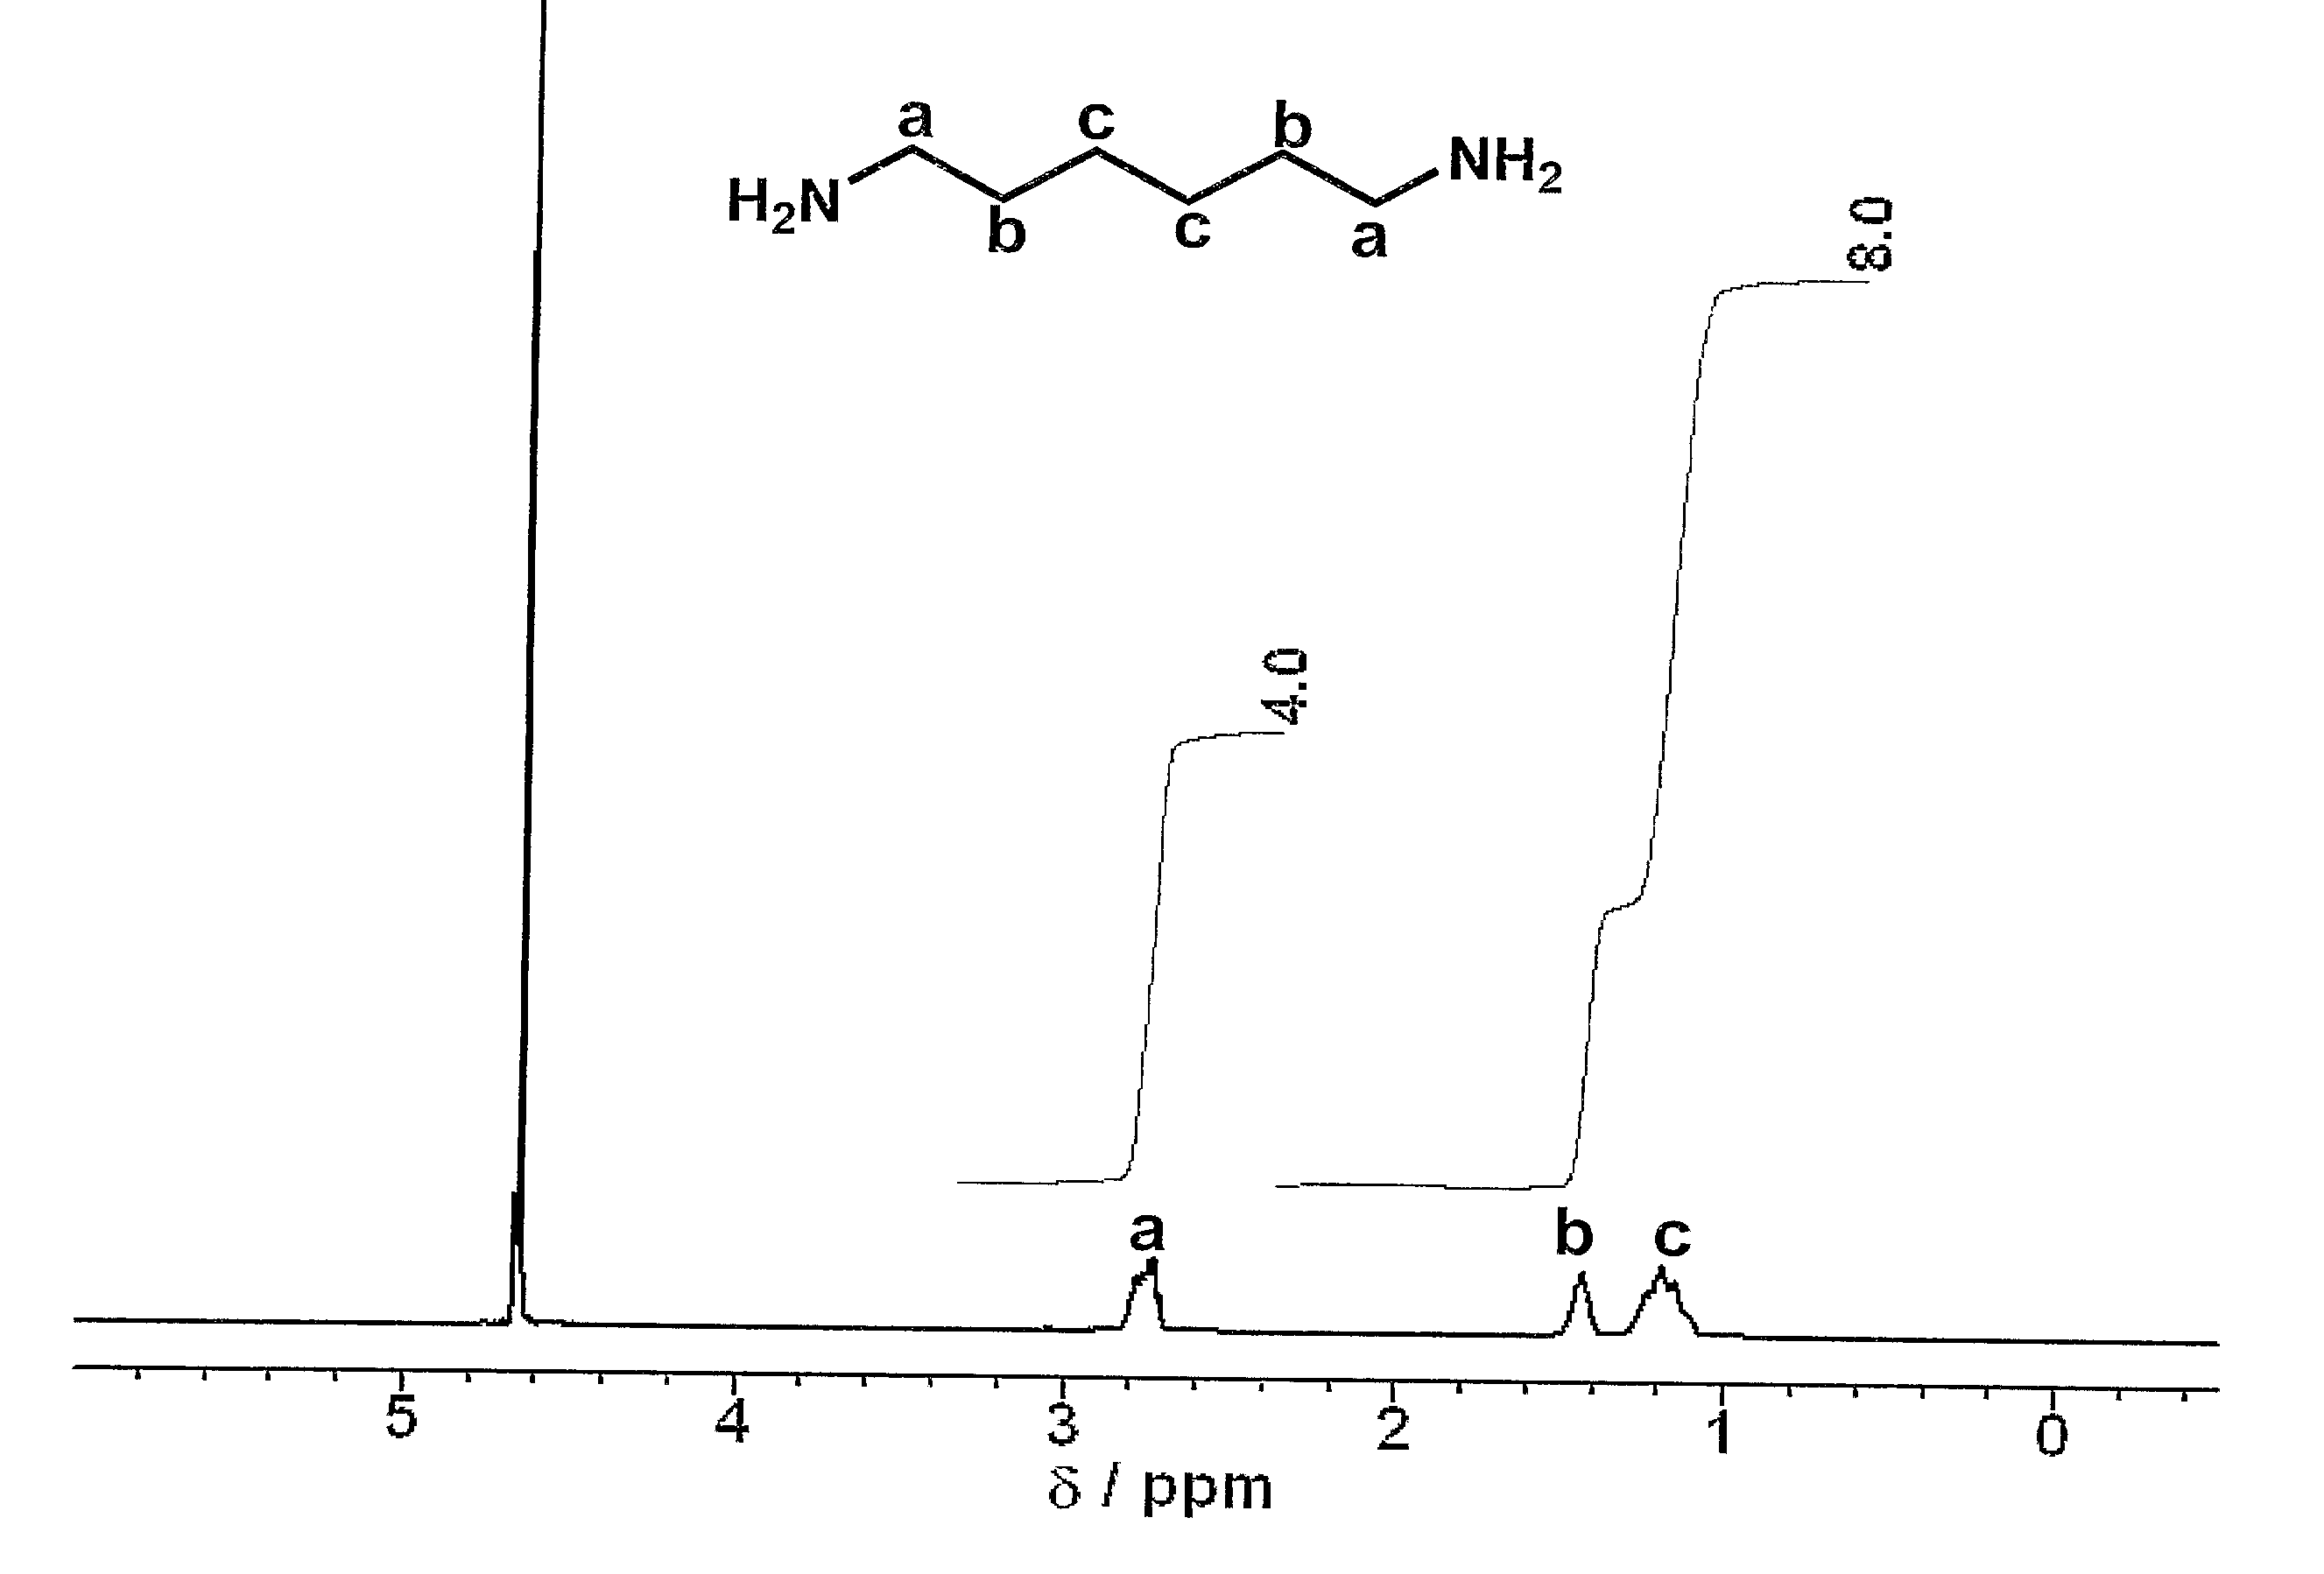 WO2010023922A1 - ヘキサメチレンジイソシアネート系ポリウレア化合物の分解処理方法          - Google PatentsFamily